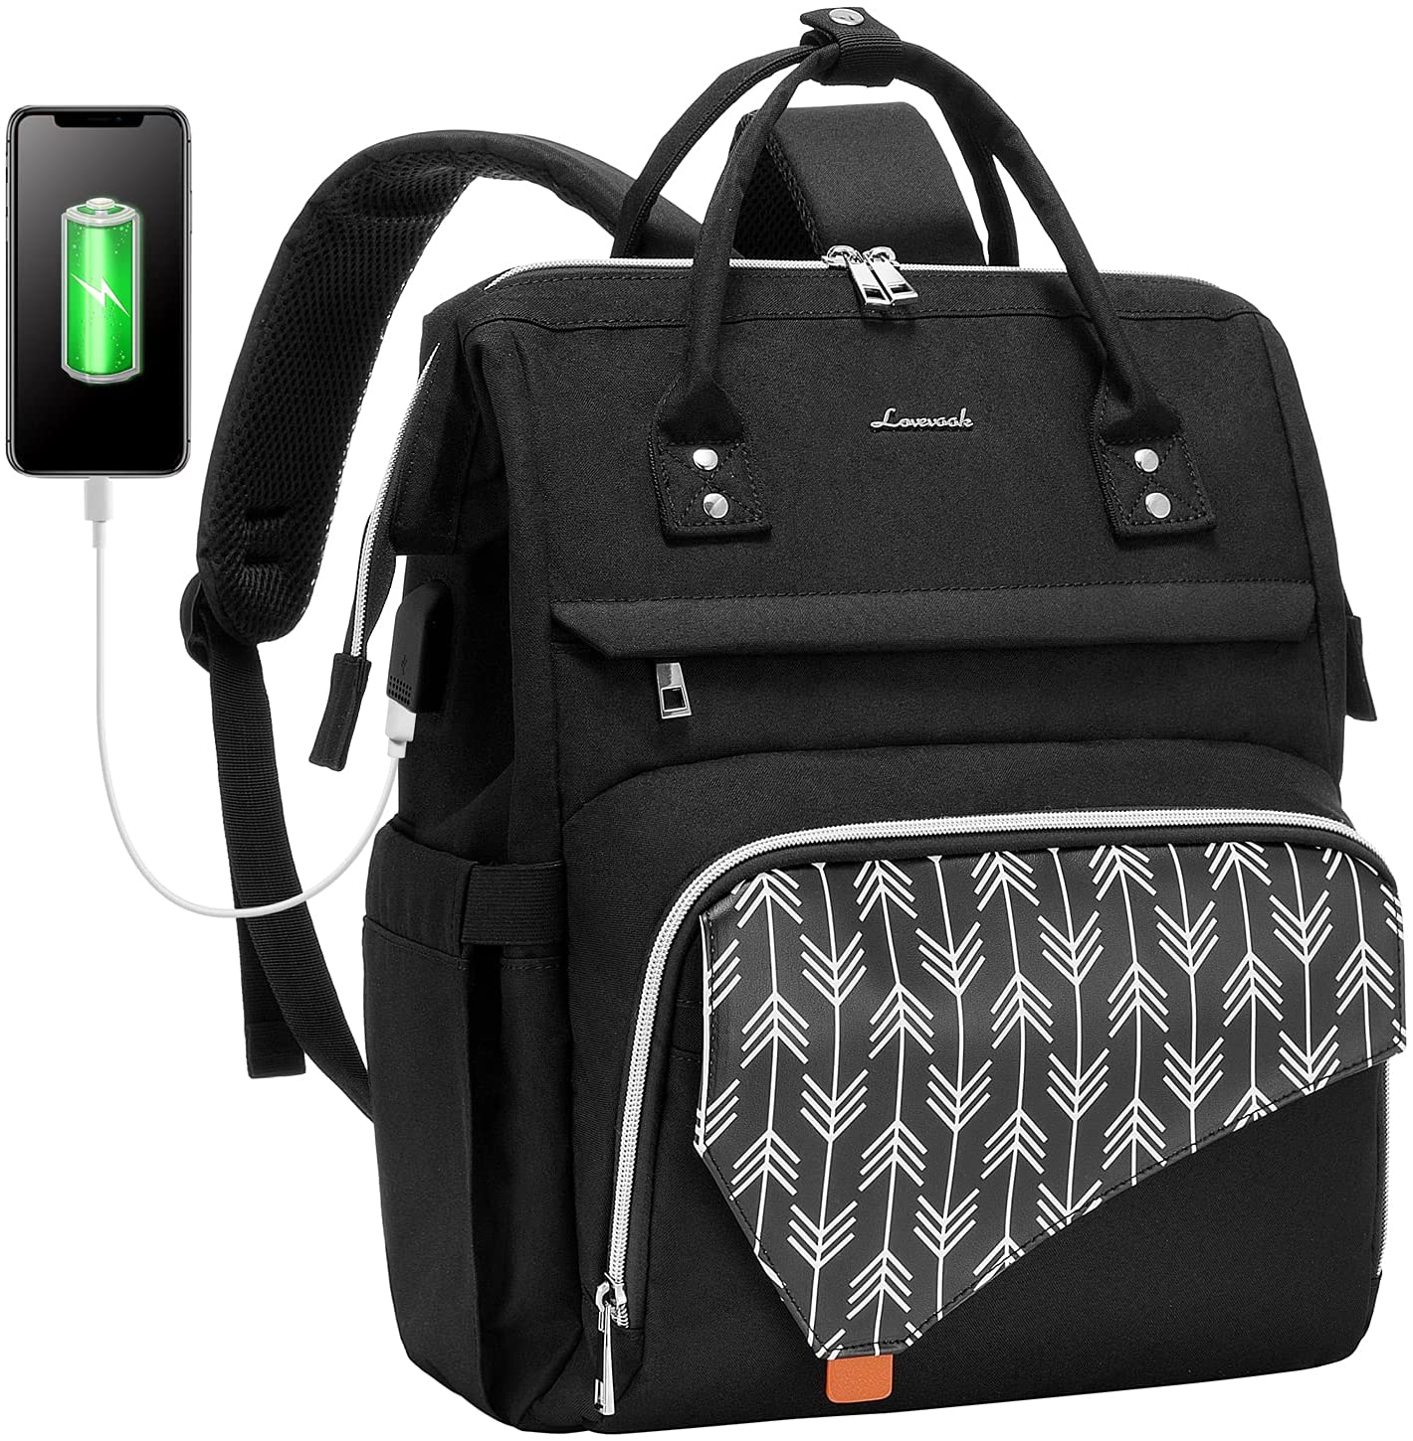 LOVEVOOK Laptop Backpack for Women,15.6 Inch Work School Travel Bag Computer Bags Teacher Nurse Backpack Purse Bookbag (Upgraded)